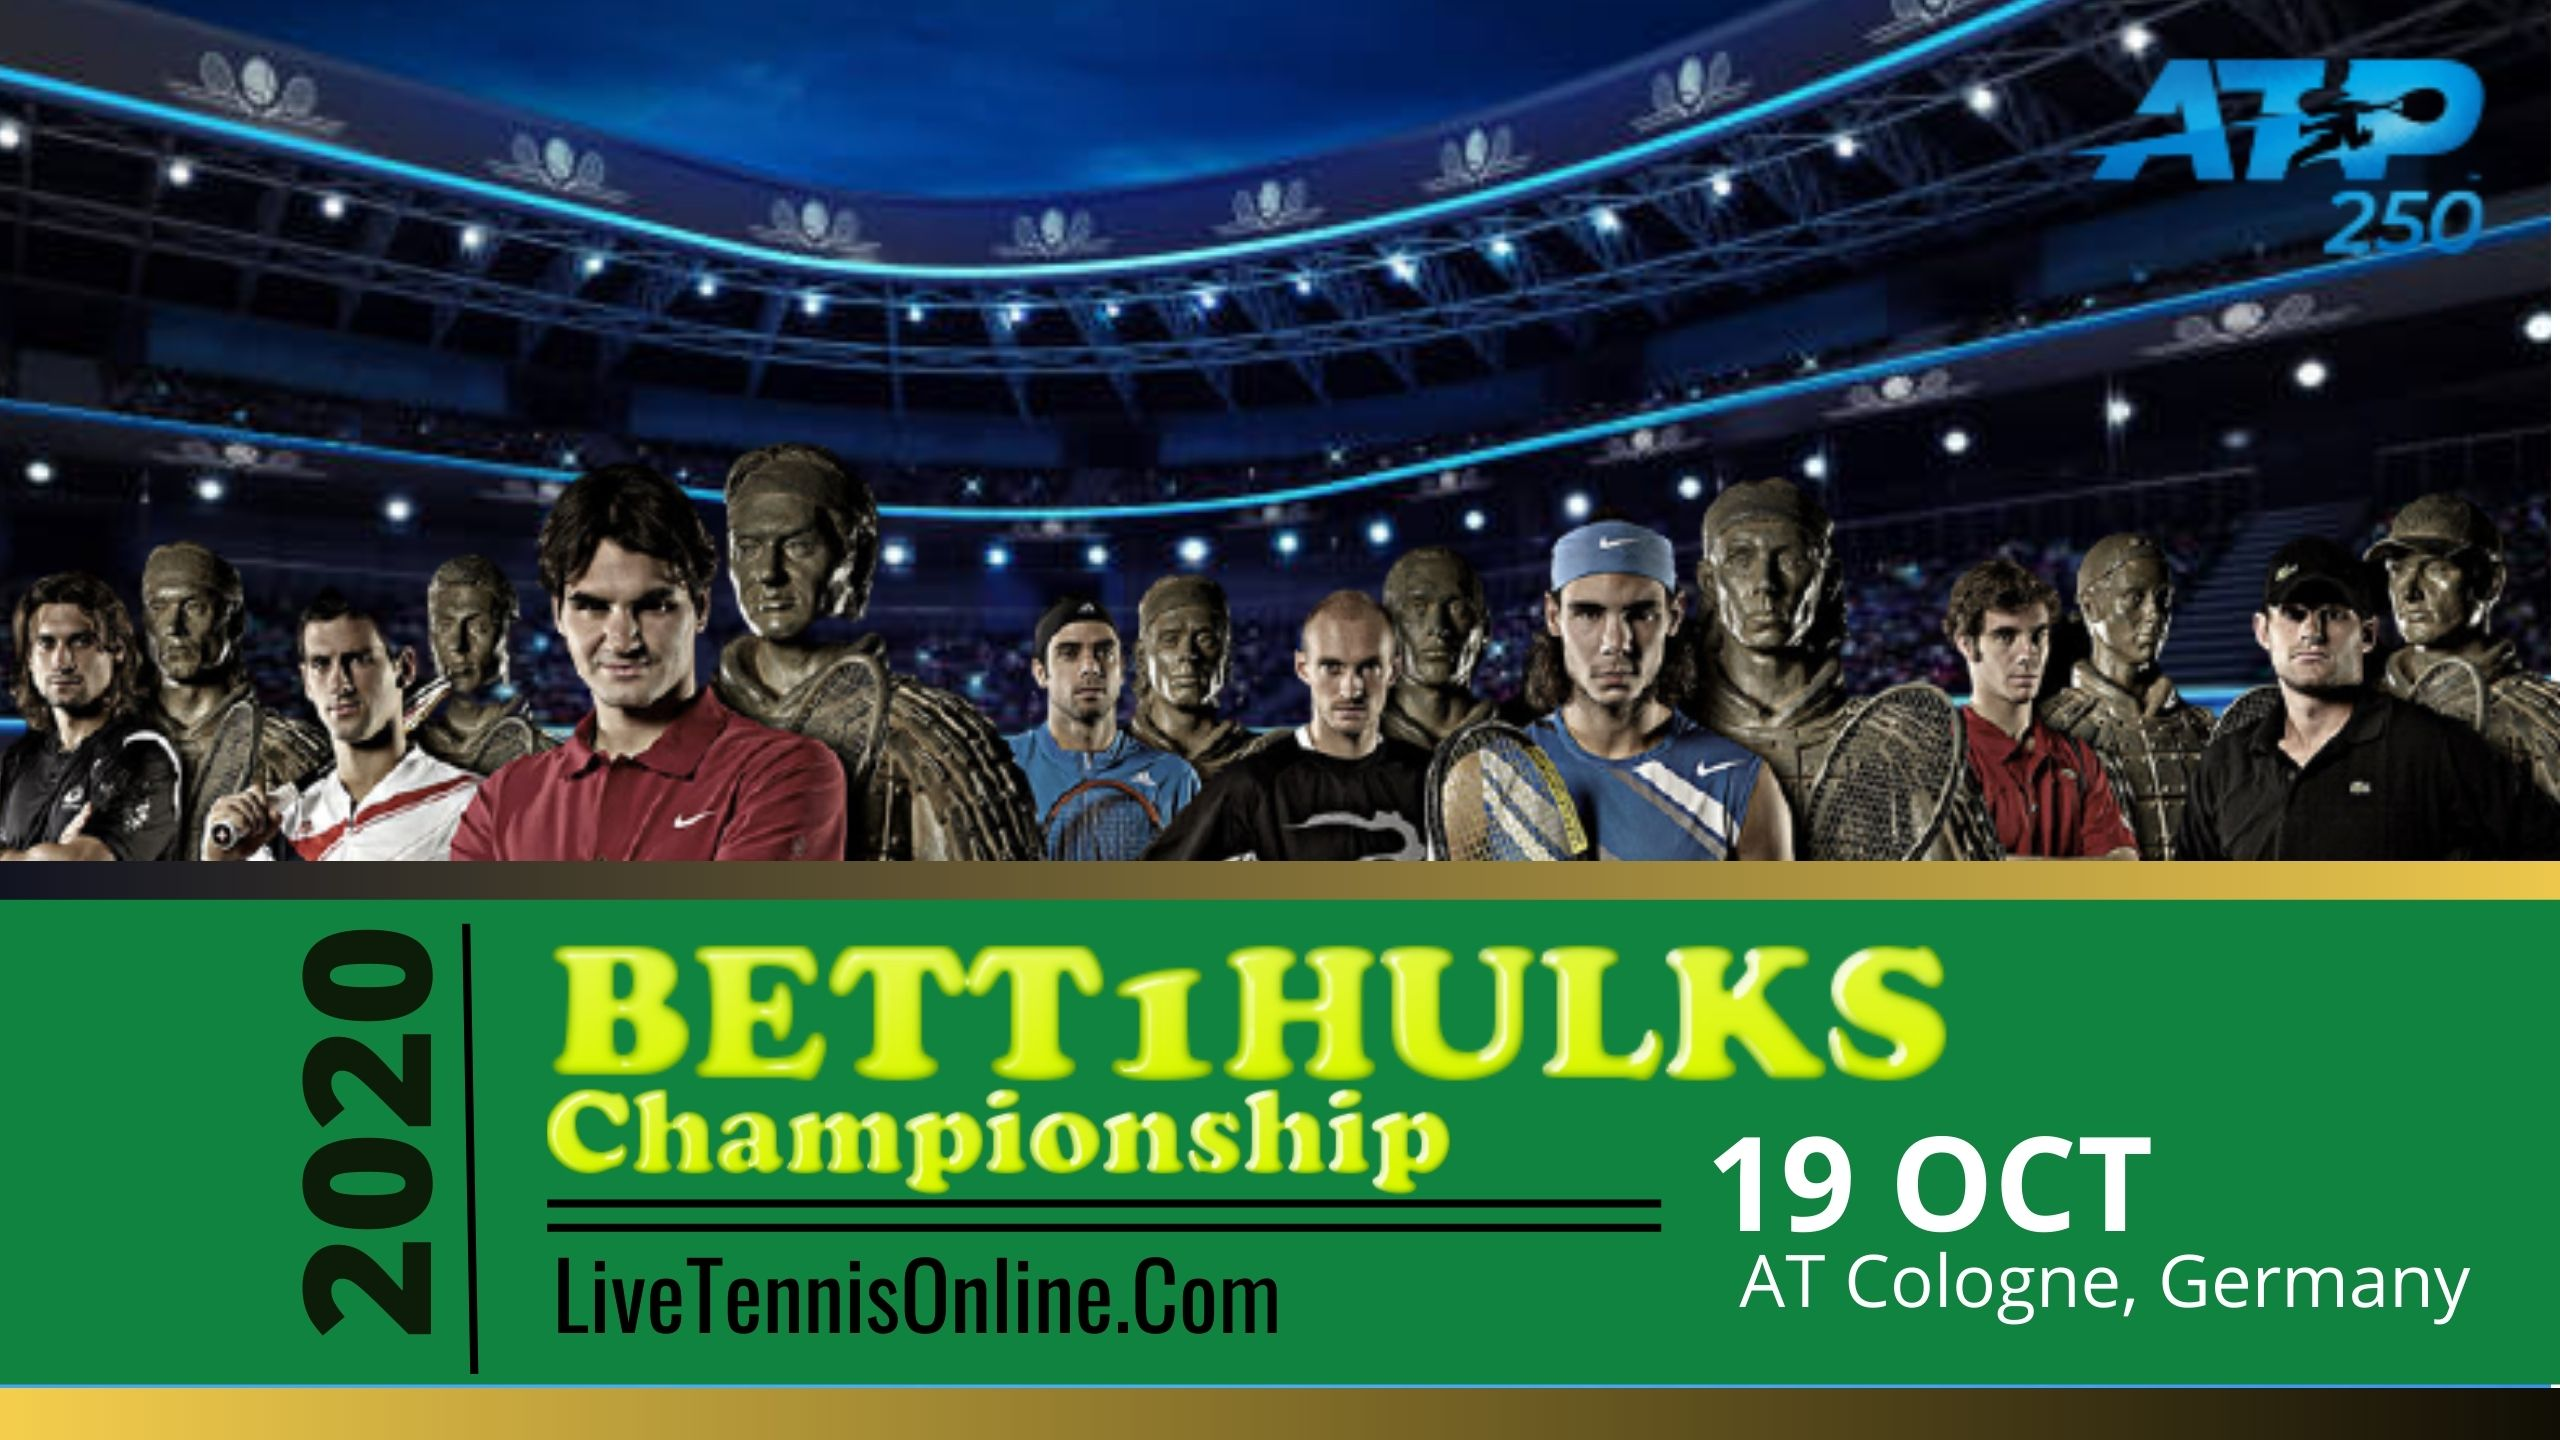 atp-bett1hulks-championships-live-stream